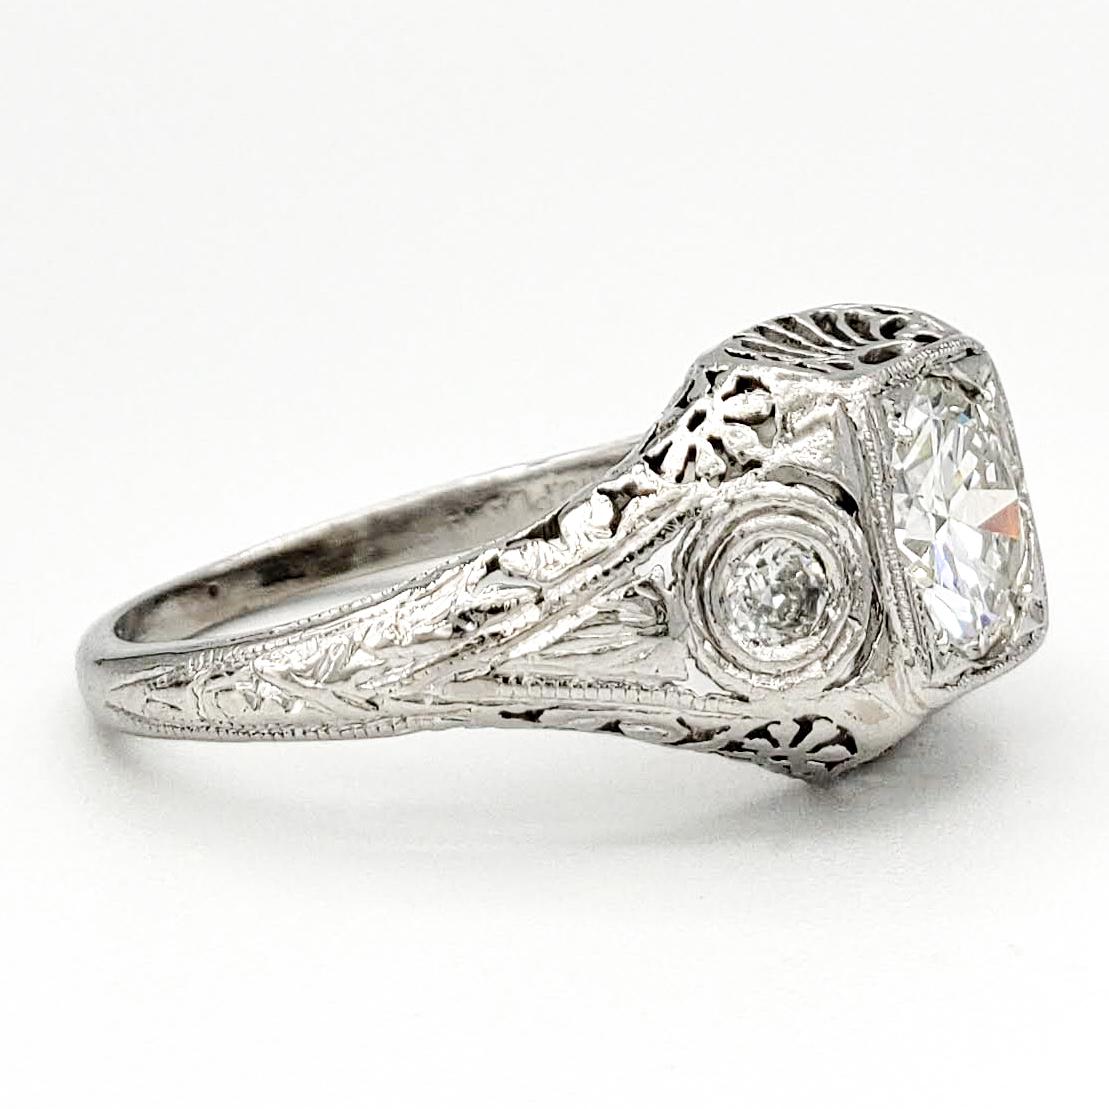 vintage-platinum-engagement-ring-with-0-84-carat-round-brilliant-cut-diamond-egl-g-si2